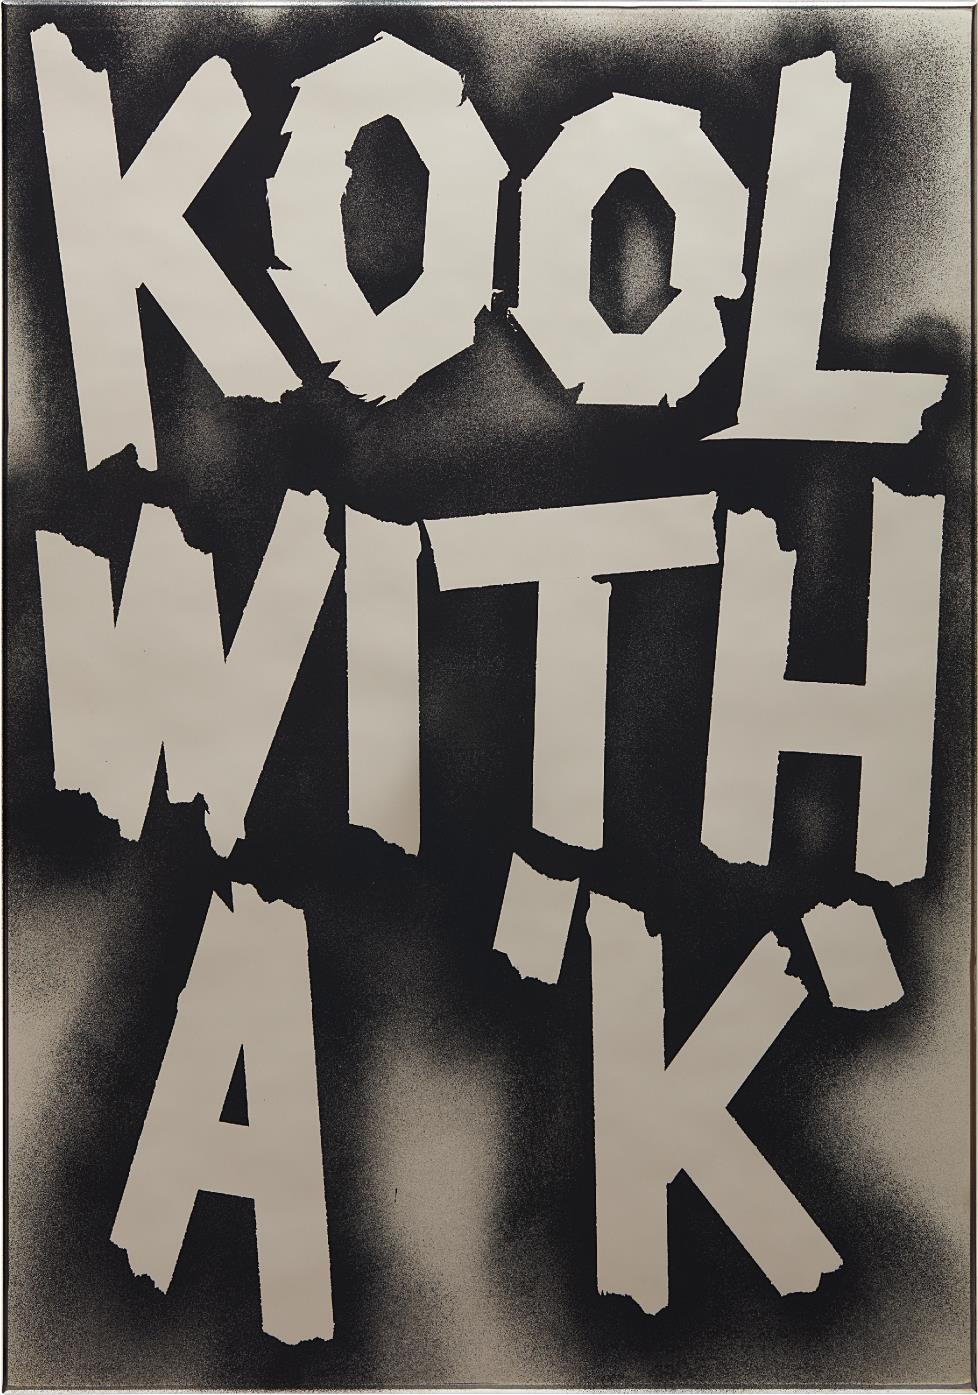 Eddie Peake-Kool With A 'K'-2012